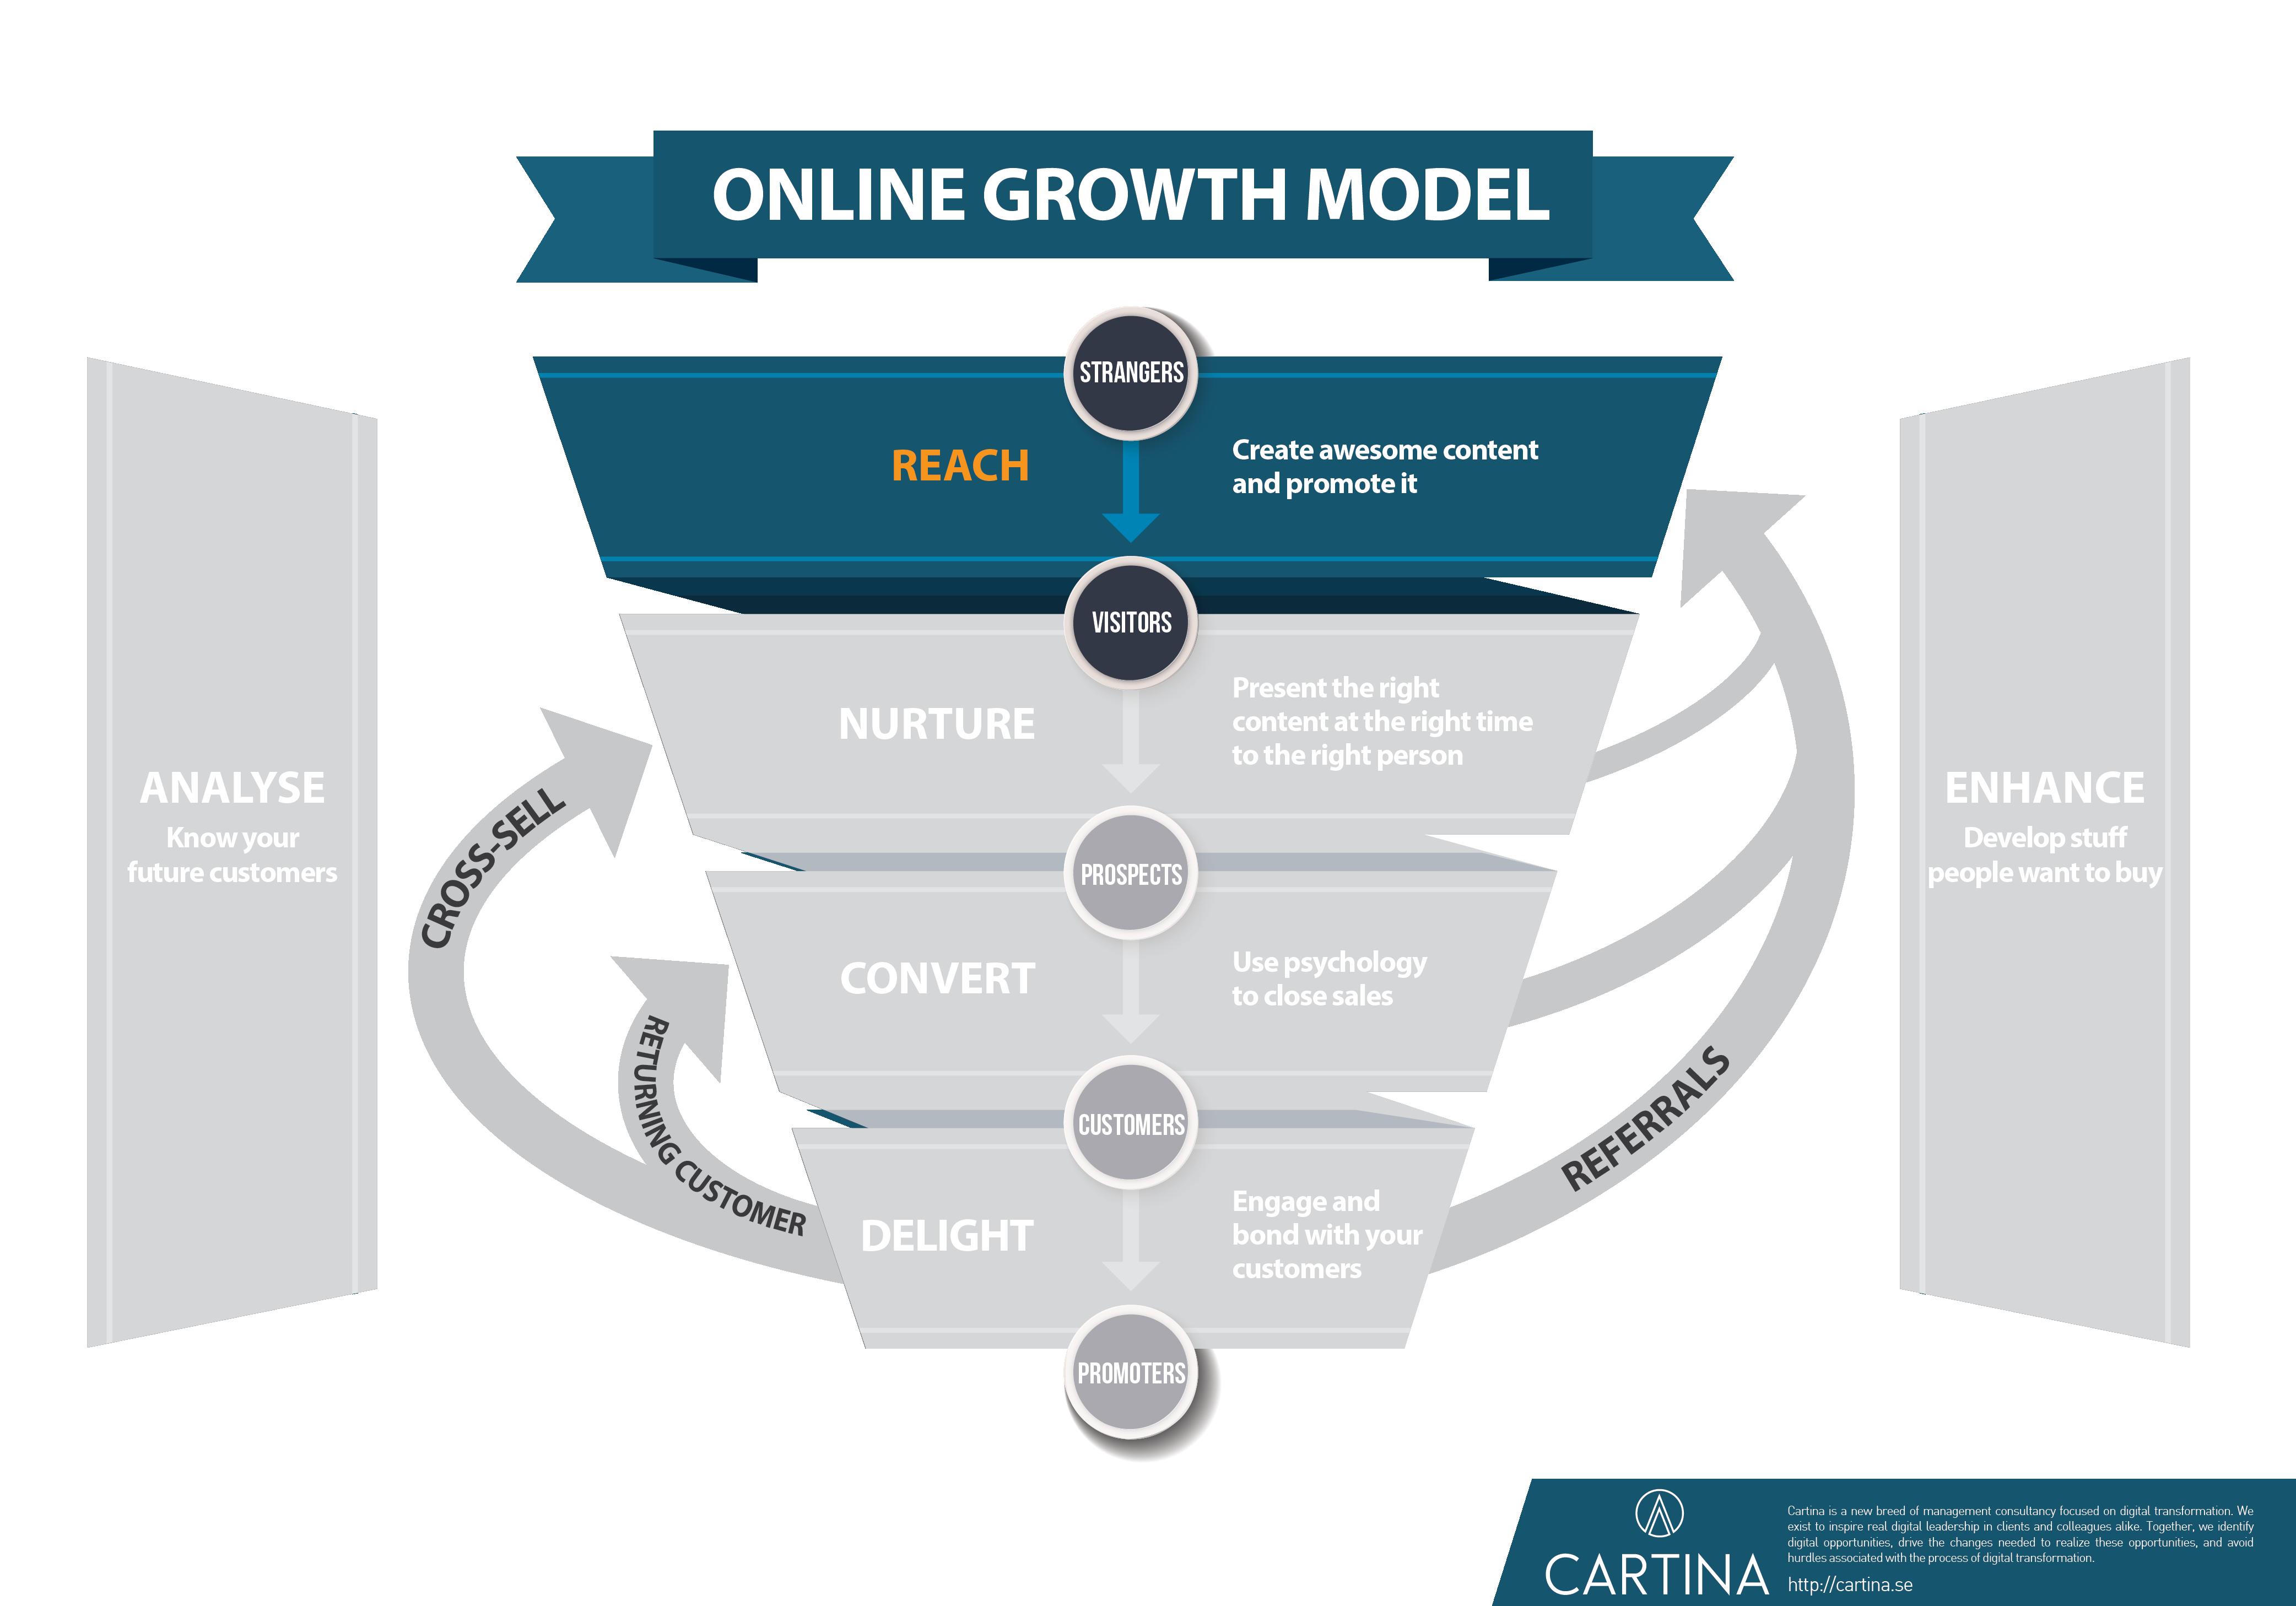 Growth model - Reach step